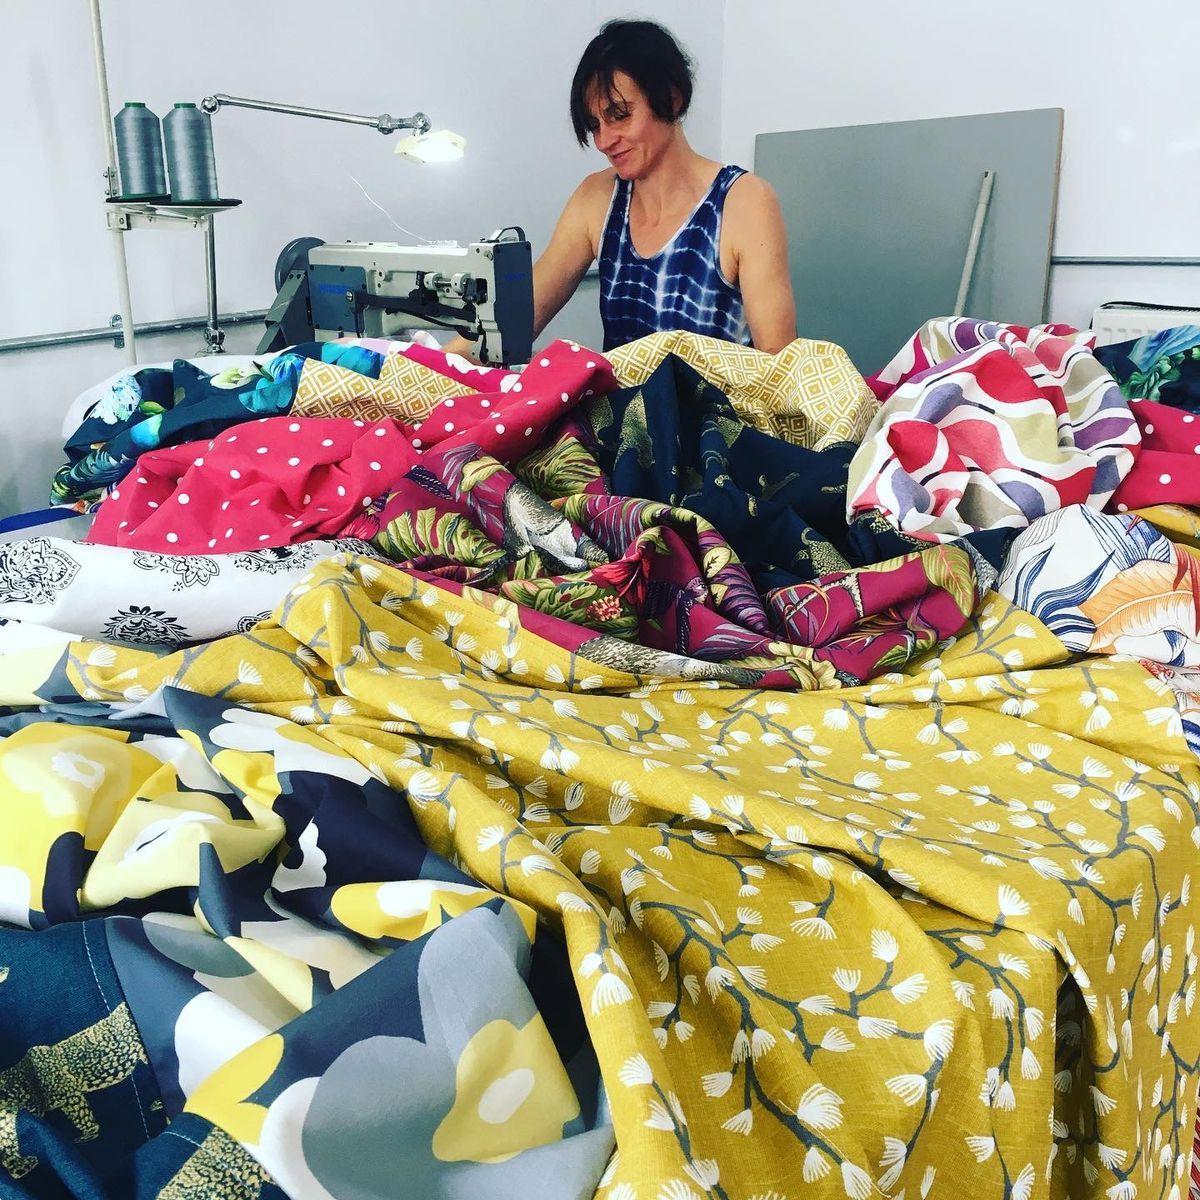 Emma Williams stitches fabric squares together